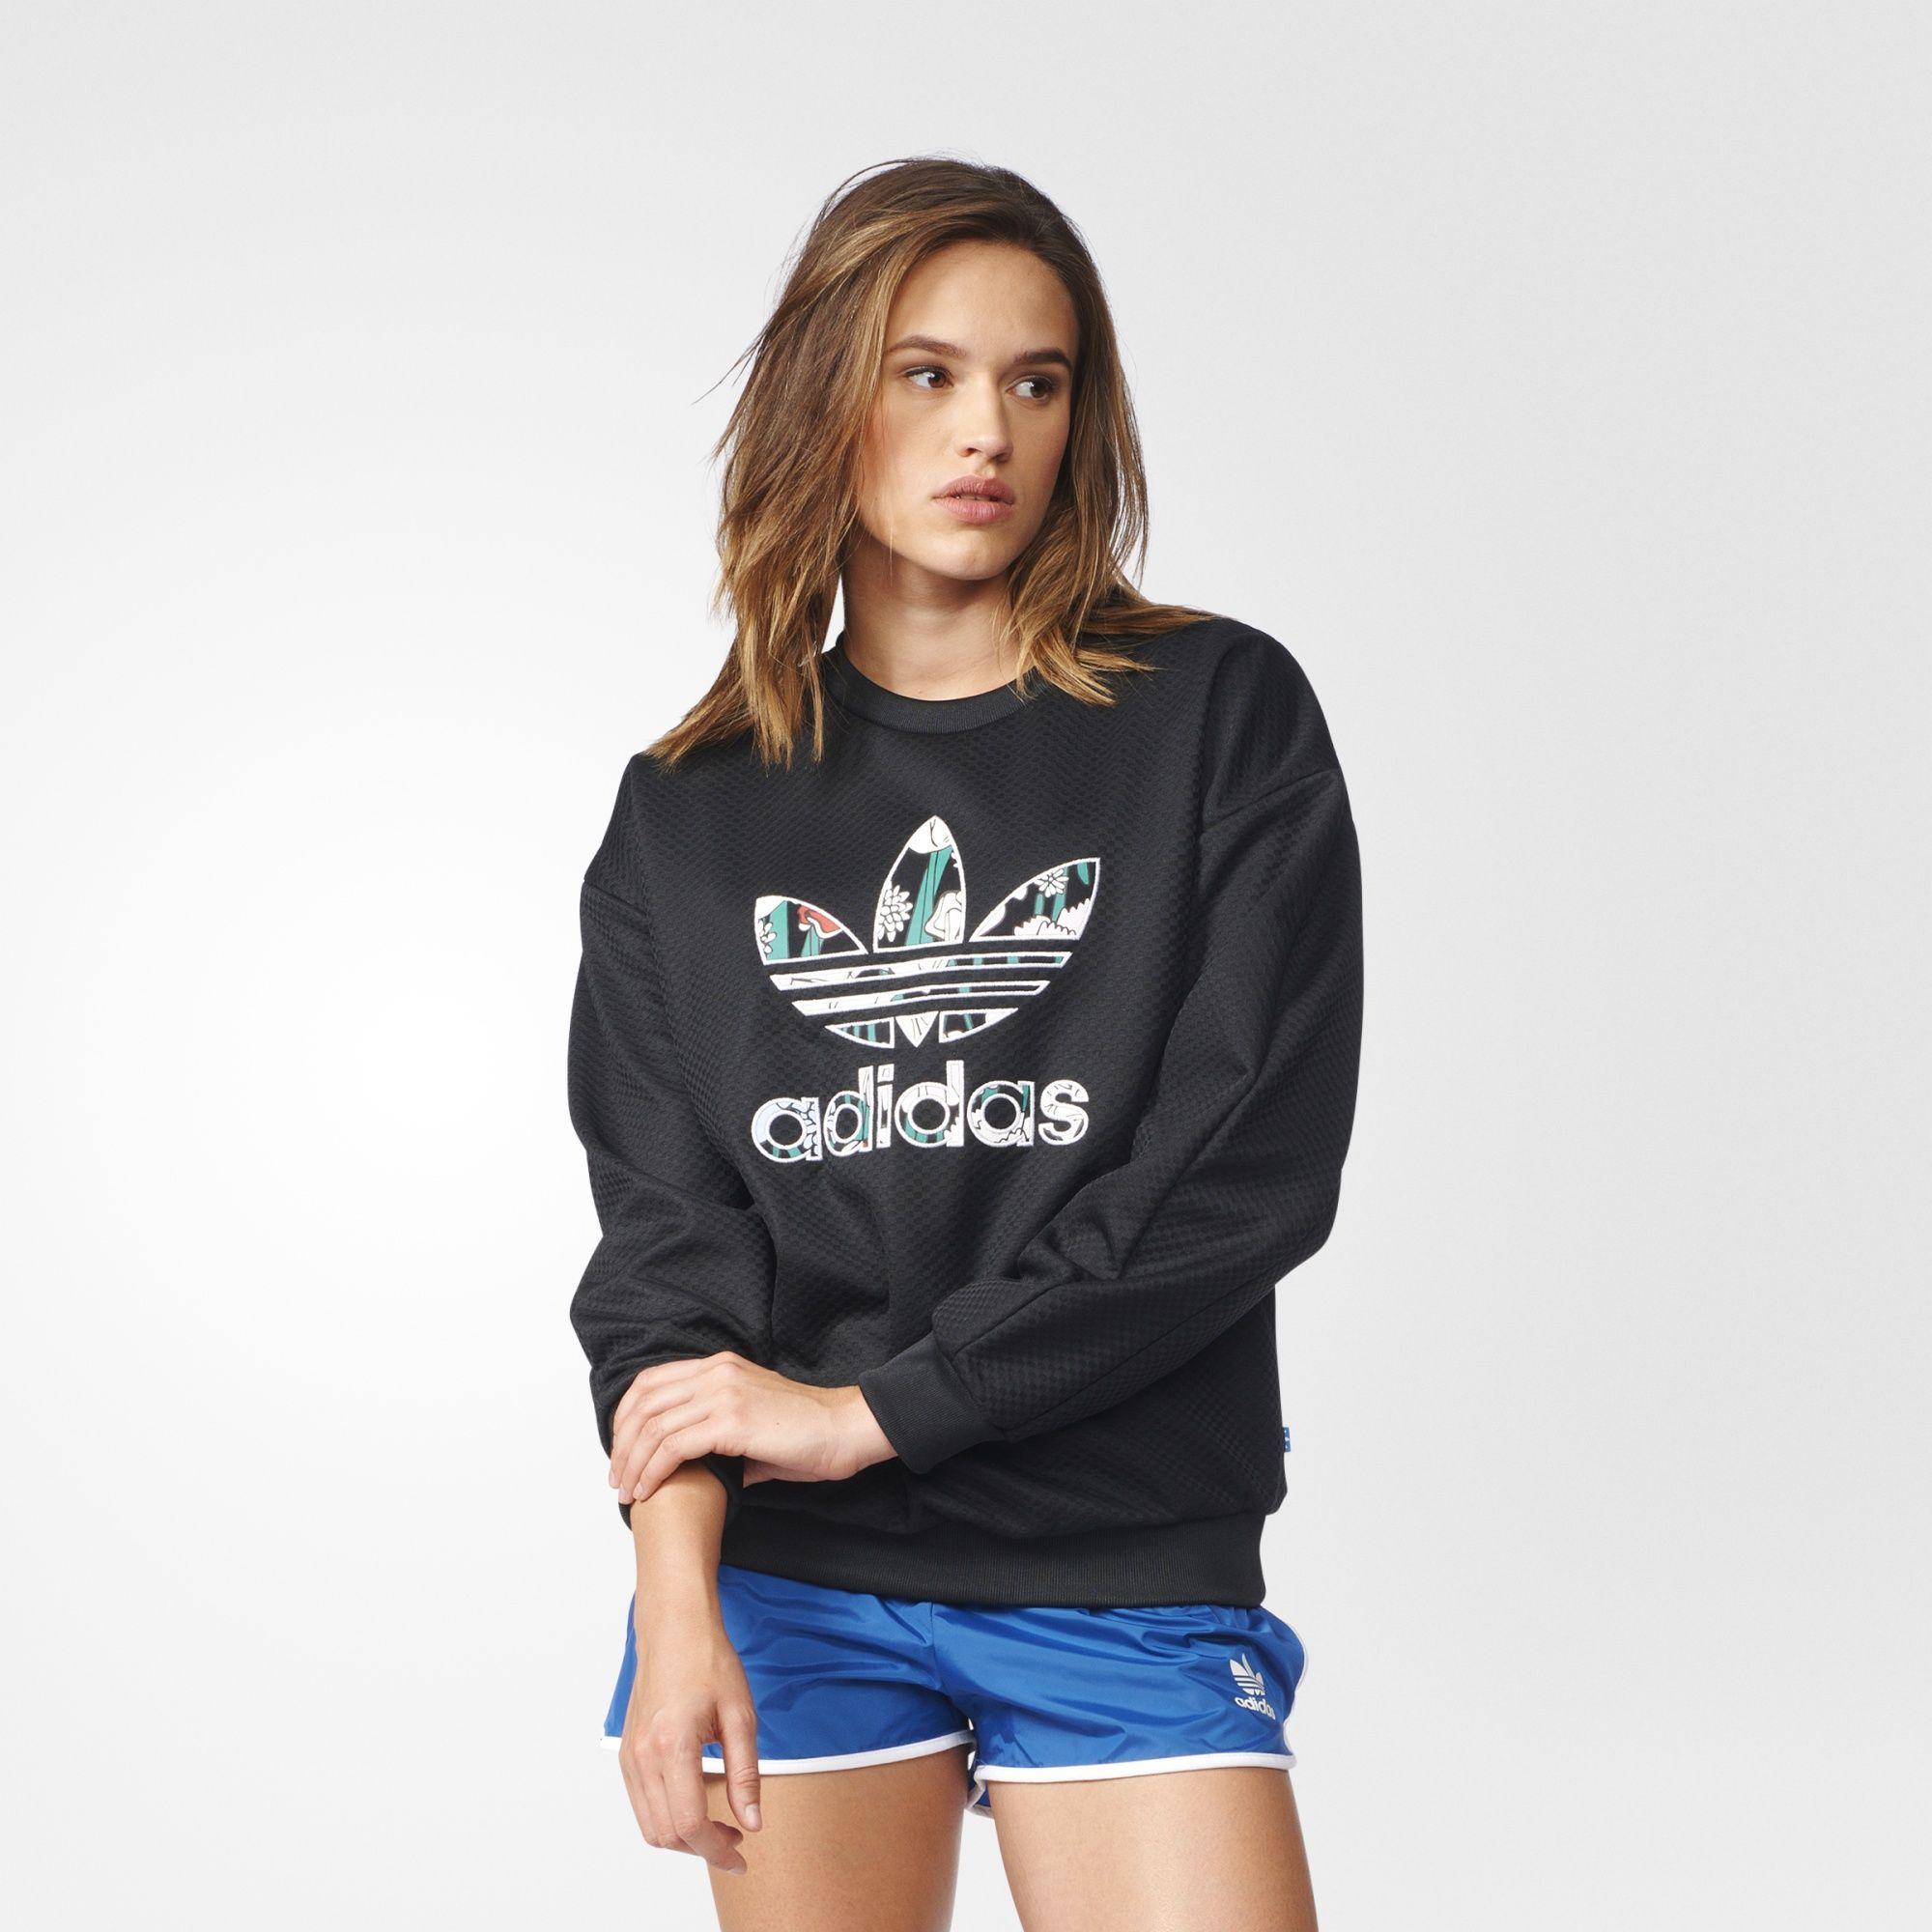 Adidas Trefoil Sweatshirt Sweatshirts Women Hoodies Sweatshirts Hoodies Womens [ 2000 x 2000 Pixel ]